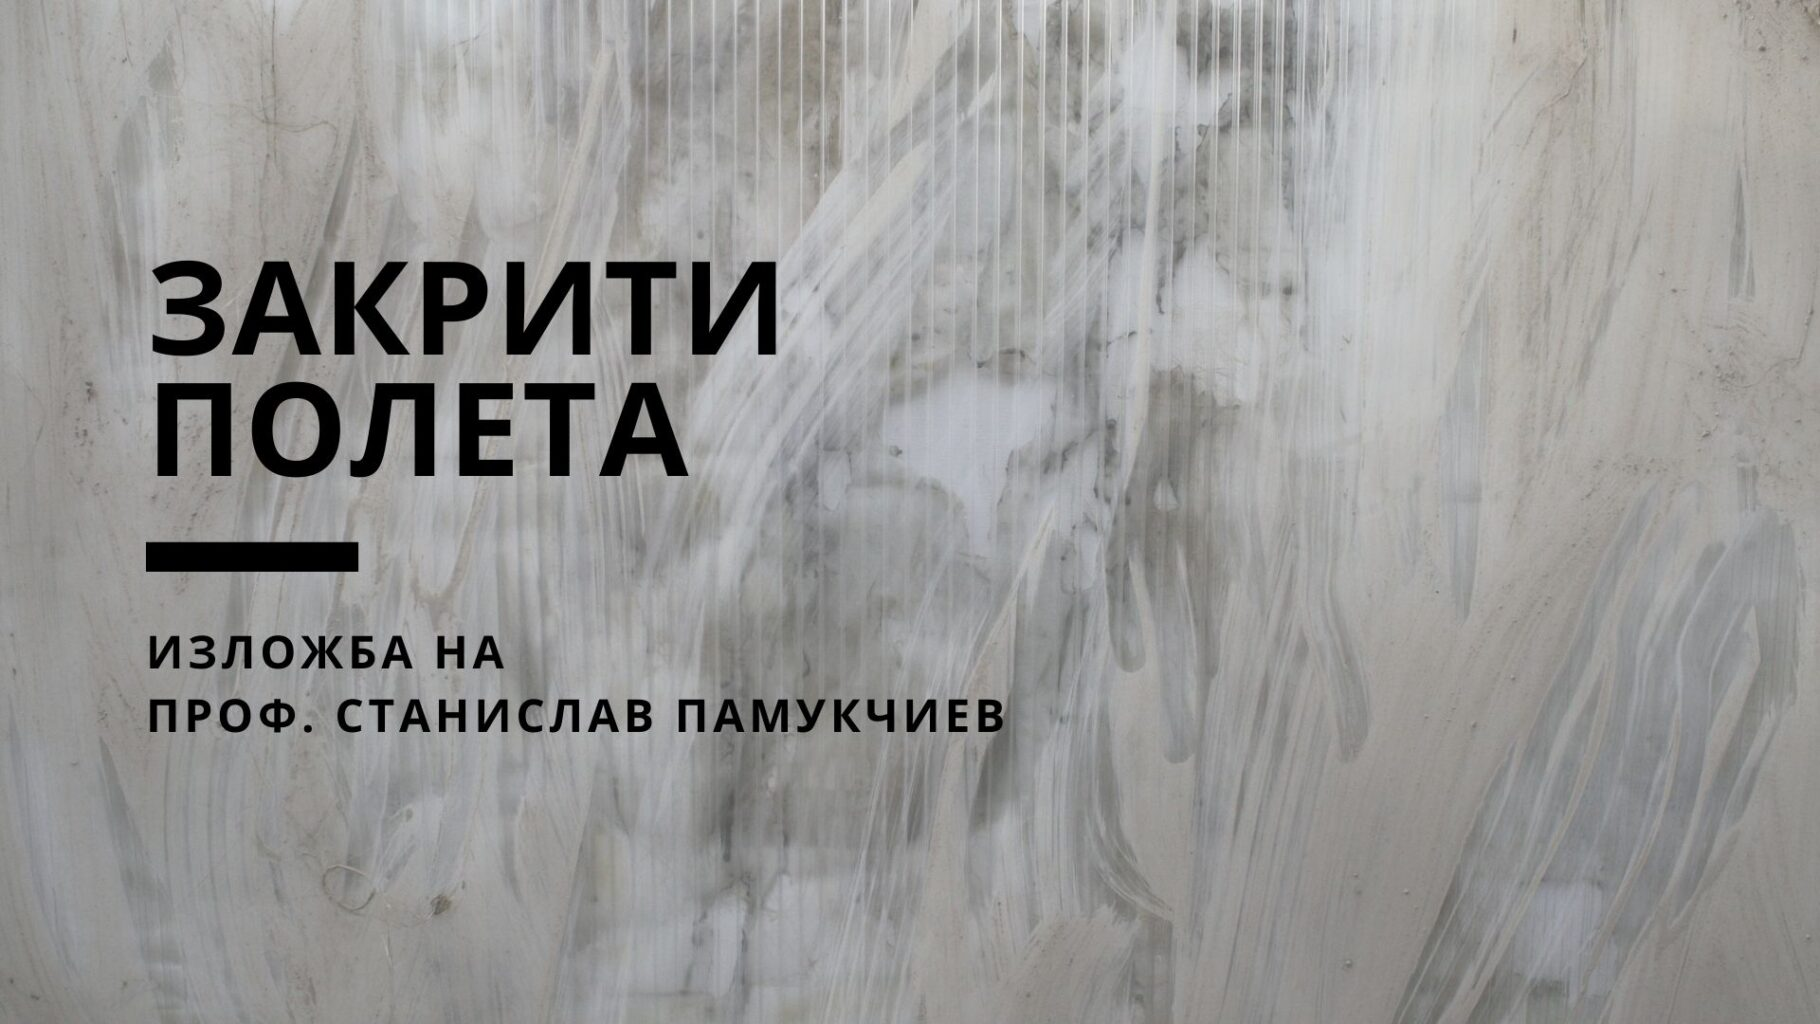 ЗАКРИТИ ПОЛЕТА – Изложба на проф. Станислав Памукчиев